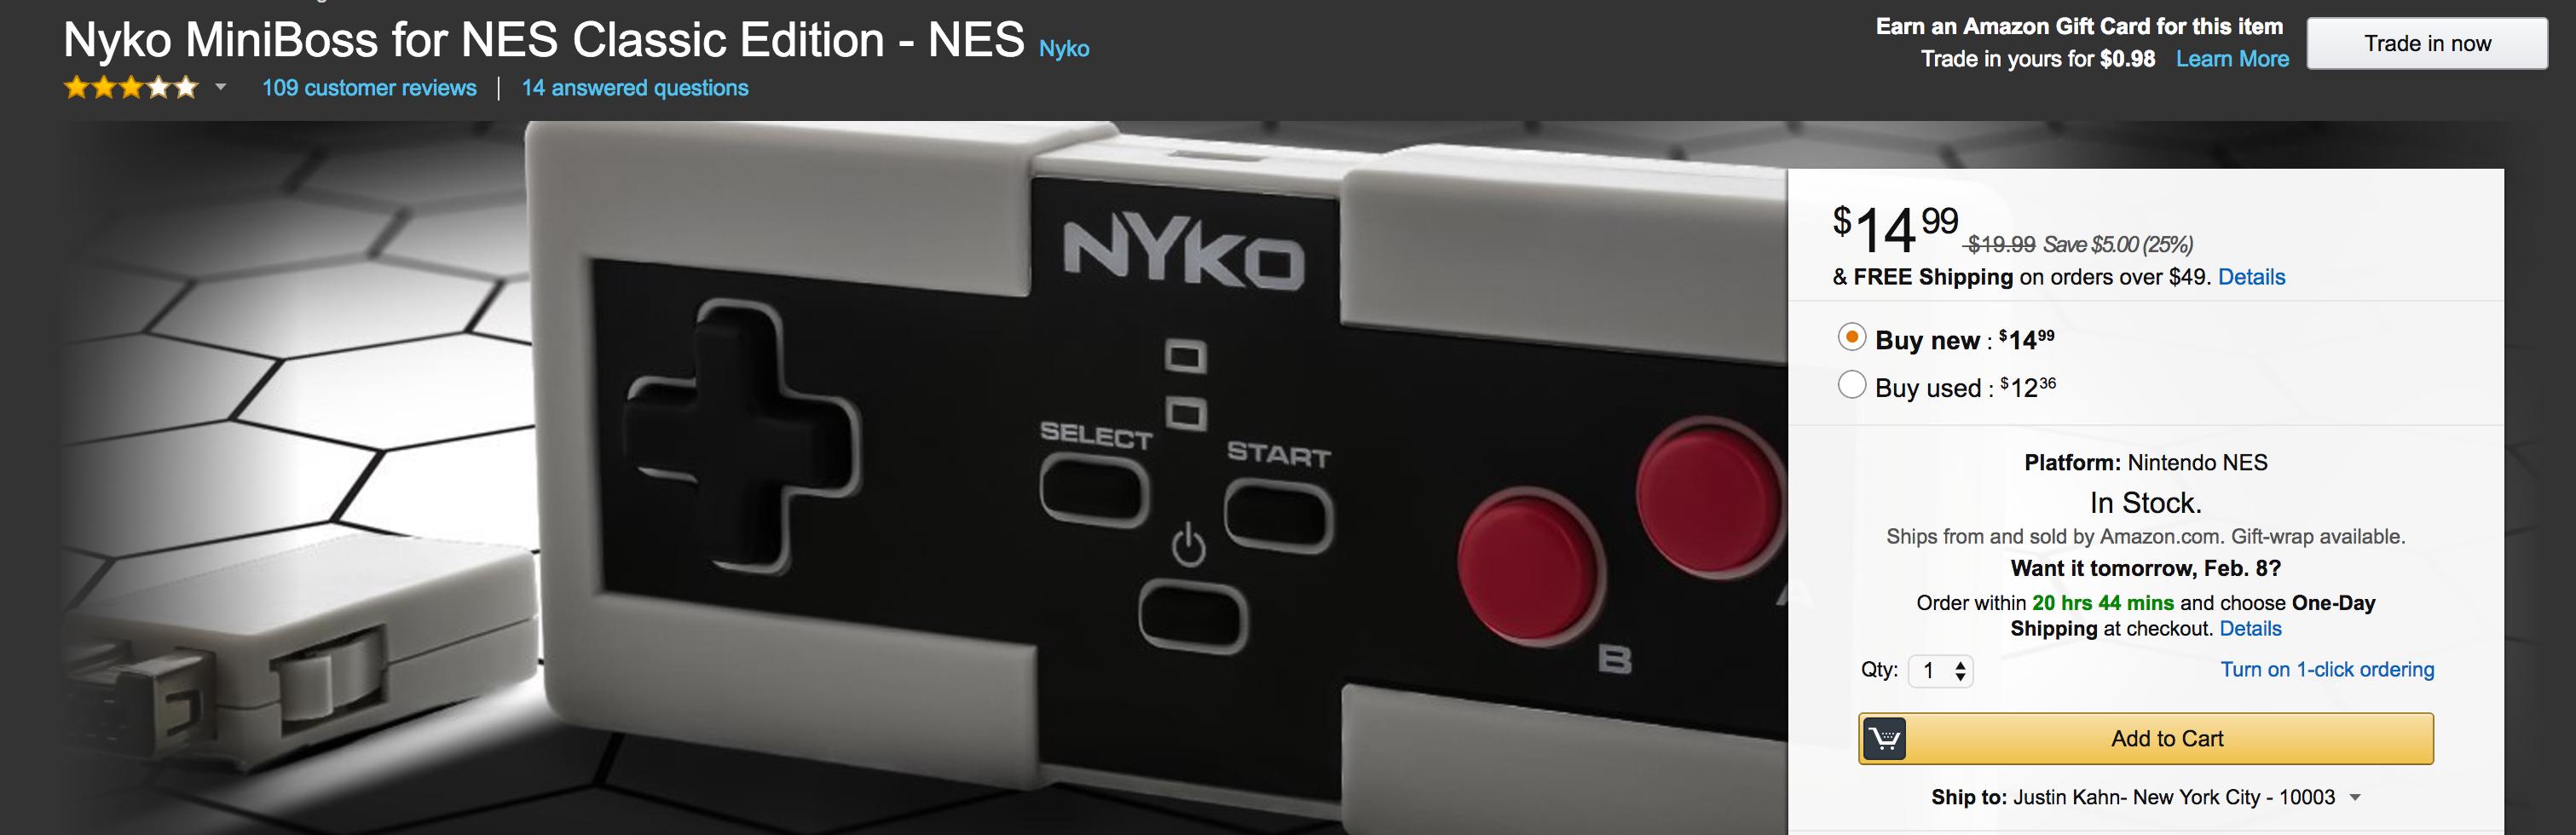 nyko-miniboss-controller-nes-classic-3